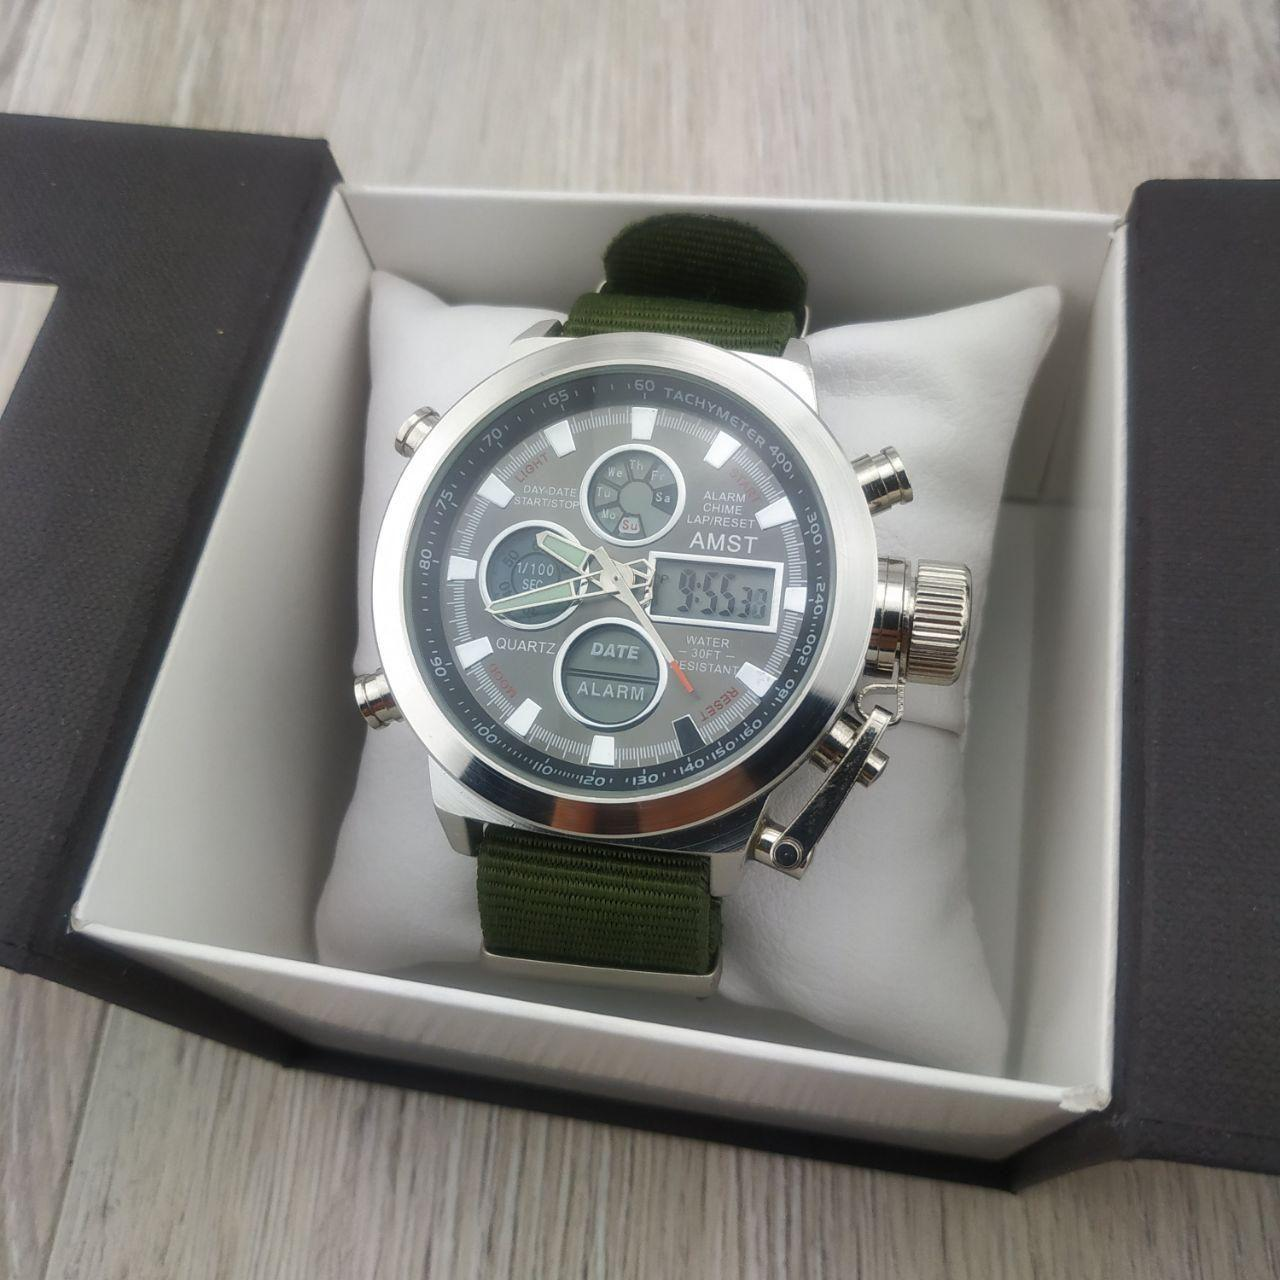 d7dbd3e35375 Мужские армейские наручные часы Amst am 3003 silver black на военном  ремешке амст